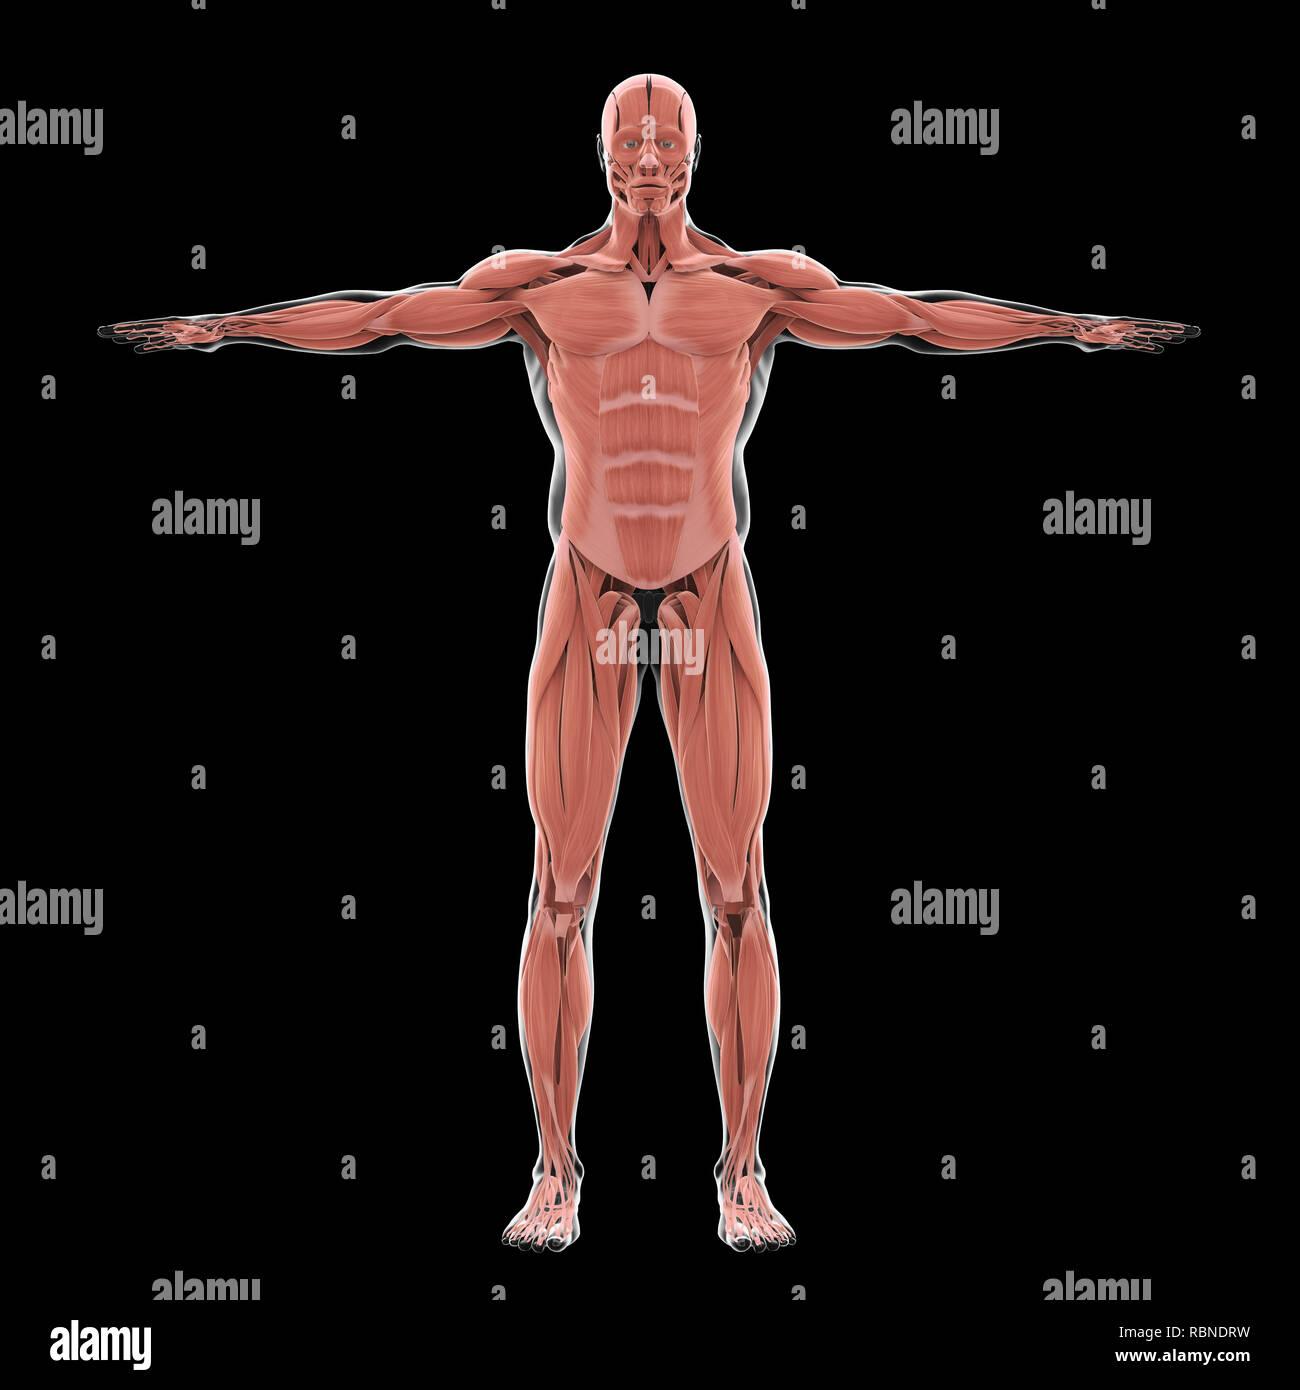 Human Muscle Illustration Stock Photos Human Muscle Illustration